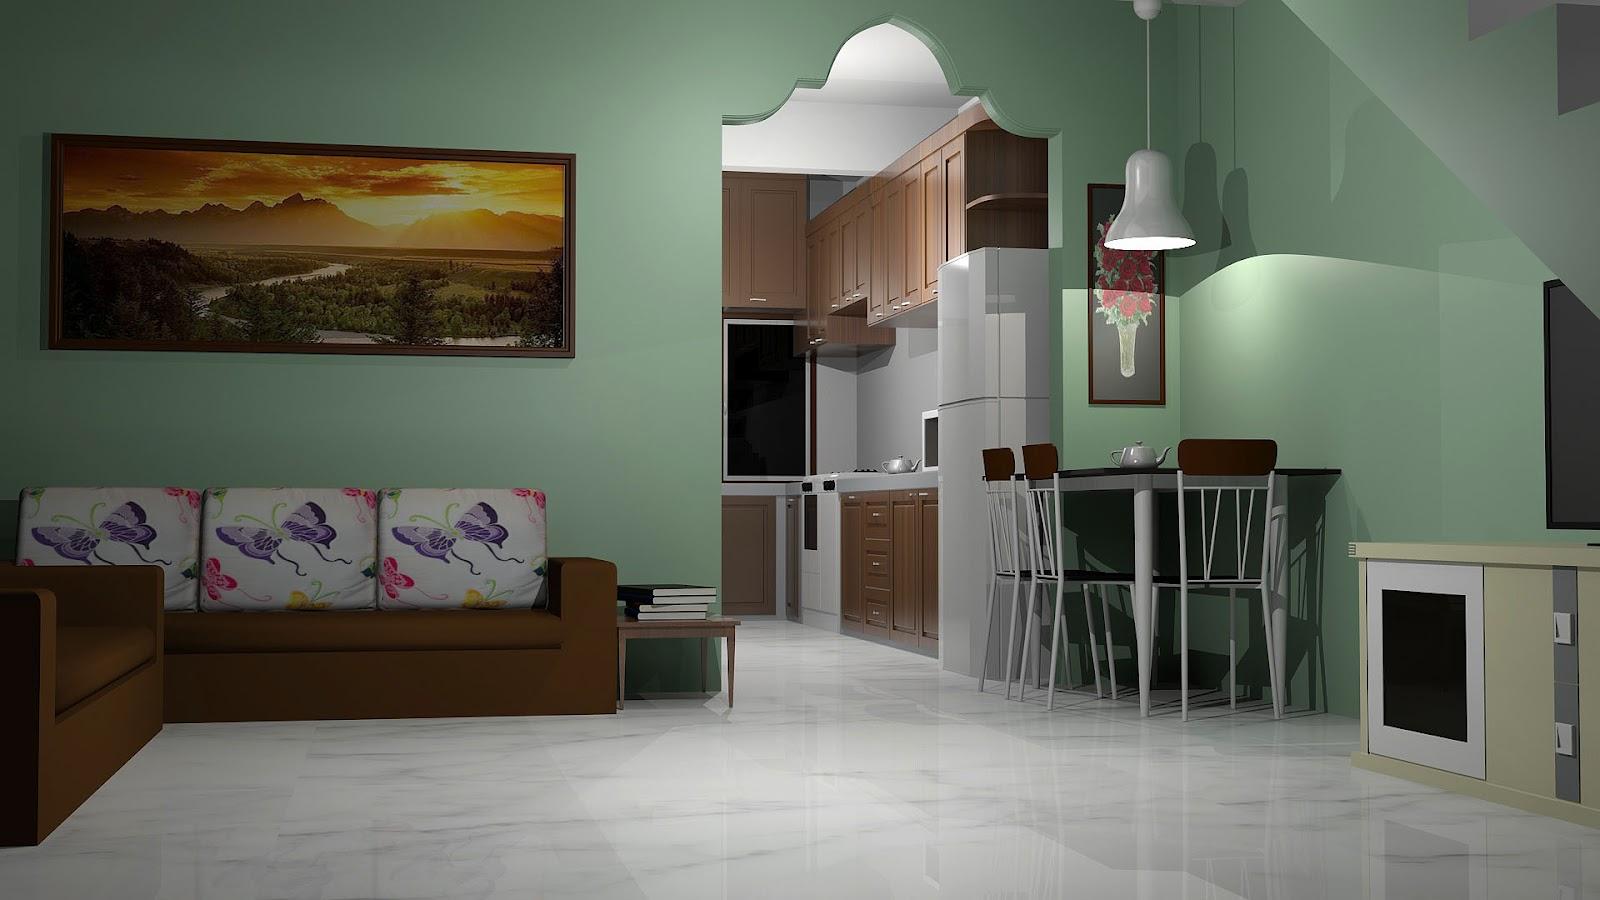 Islamic Interior  Exterior Design Ubahsuai ruang tamu dan dapur  Design rumah saiz 14 x 60